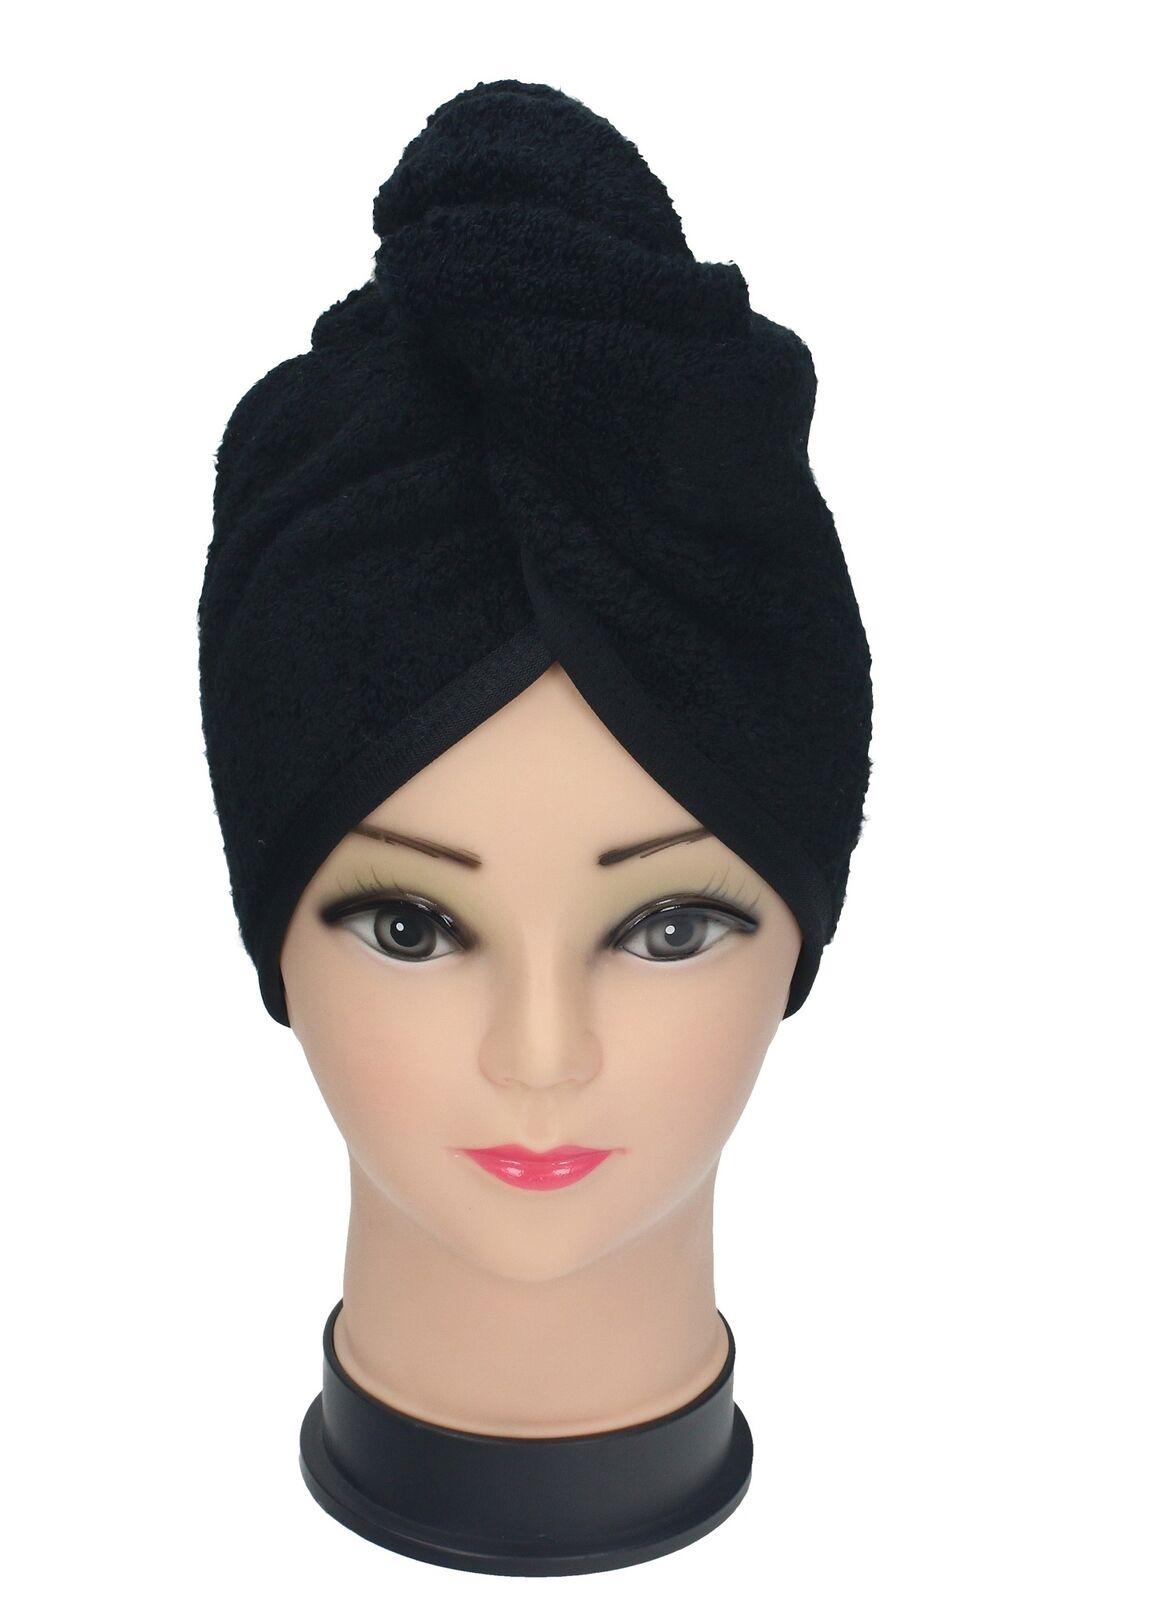 Betz Turban Handtuch Frottee Haarturban Kopftuch Damen 100% Baumwolle